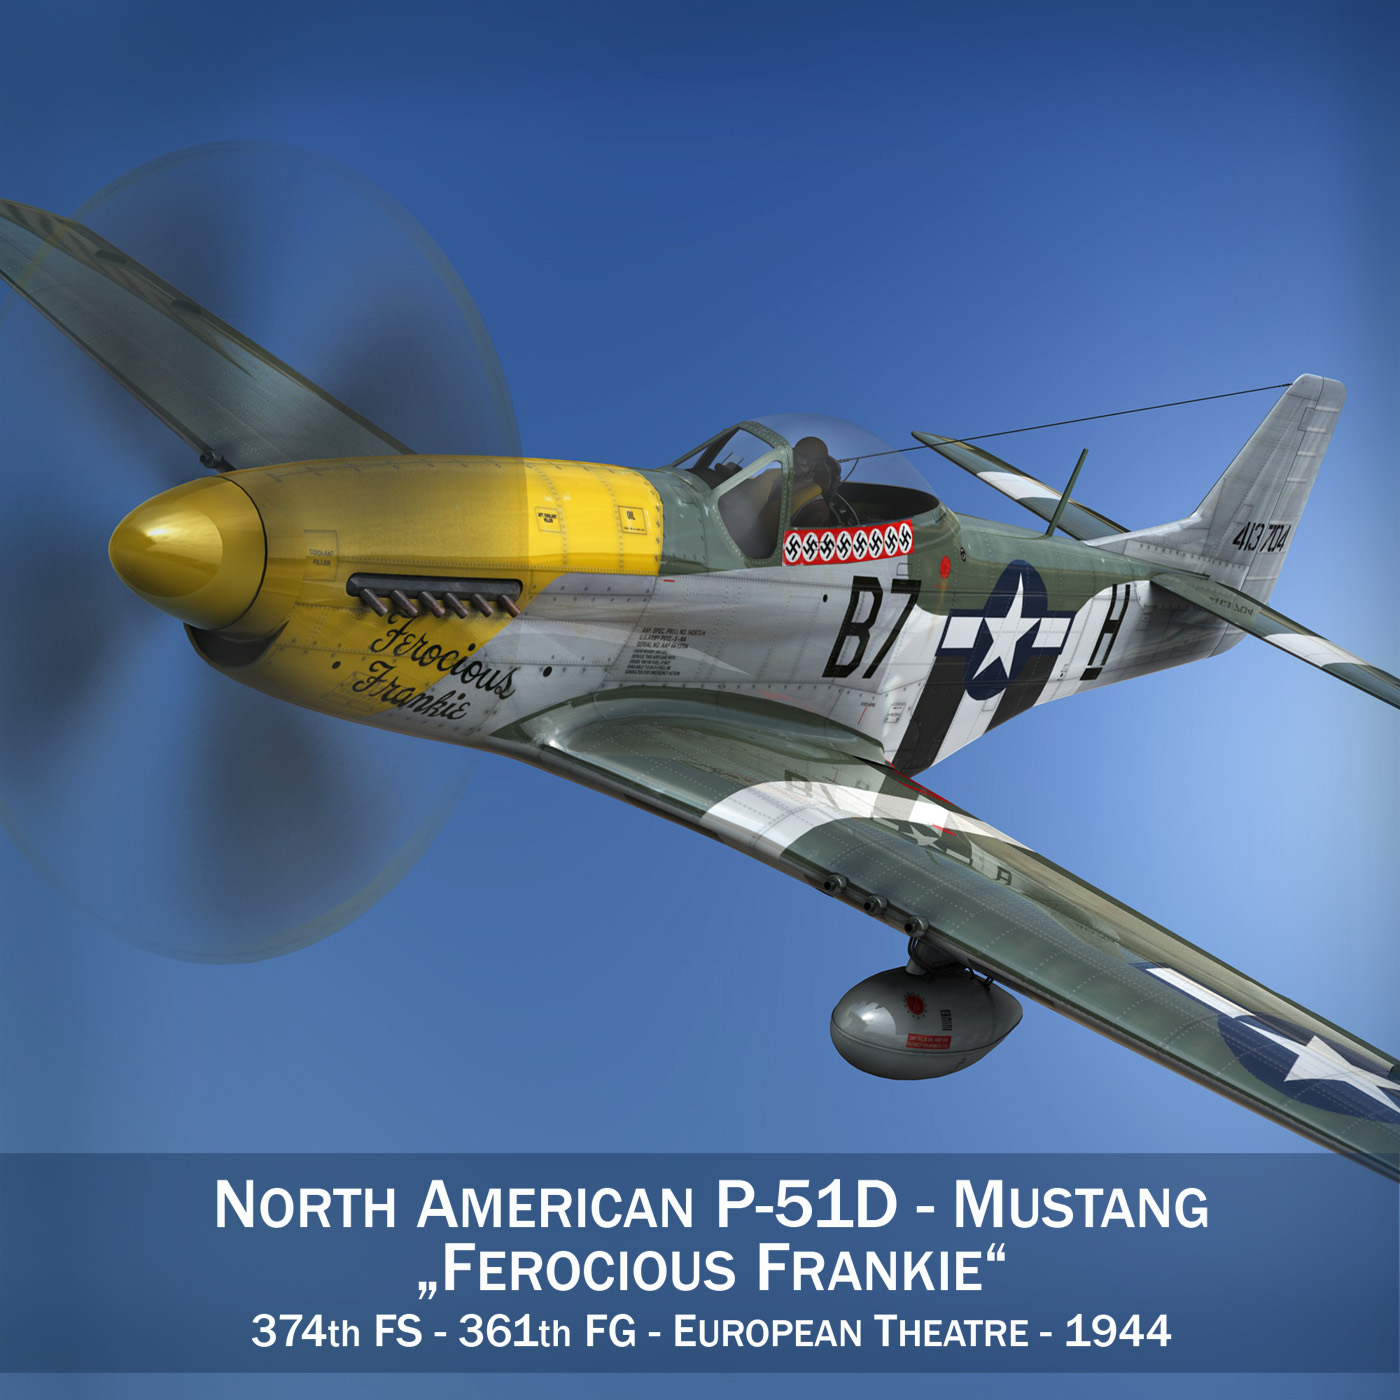 north american p-51d mustang – ferocious frankie 3d model fbx c4d lwo obj 269485